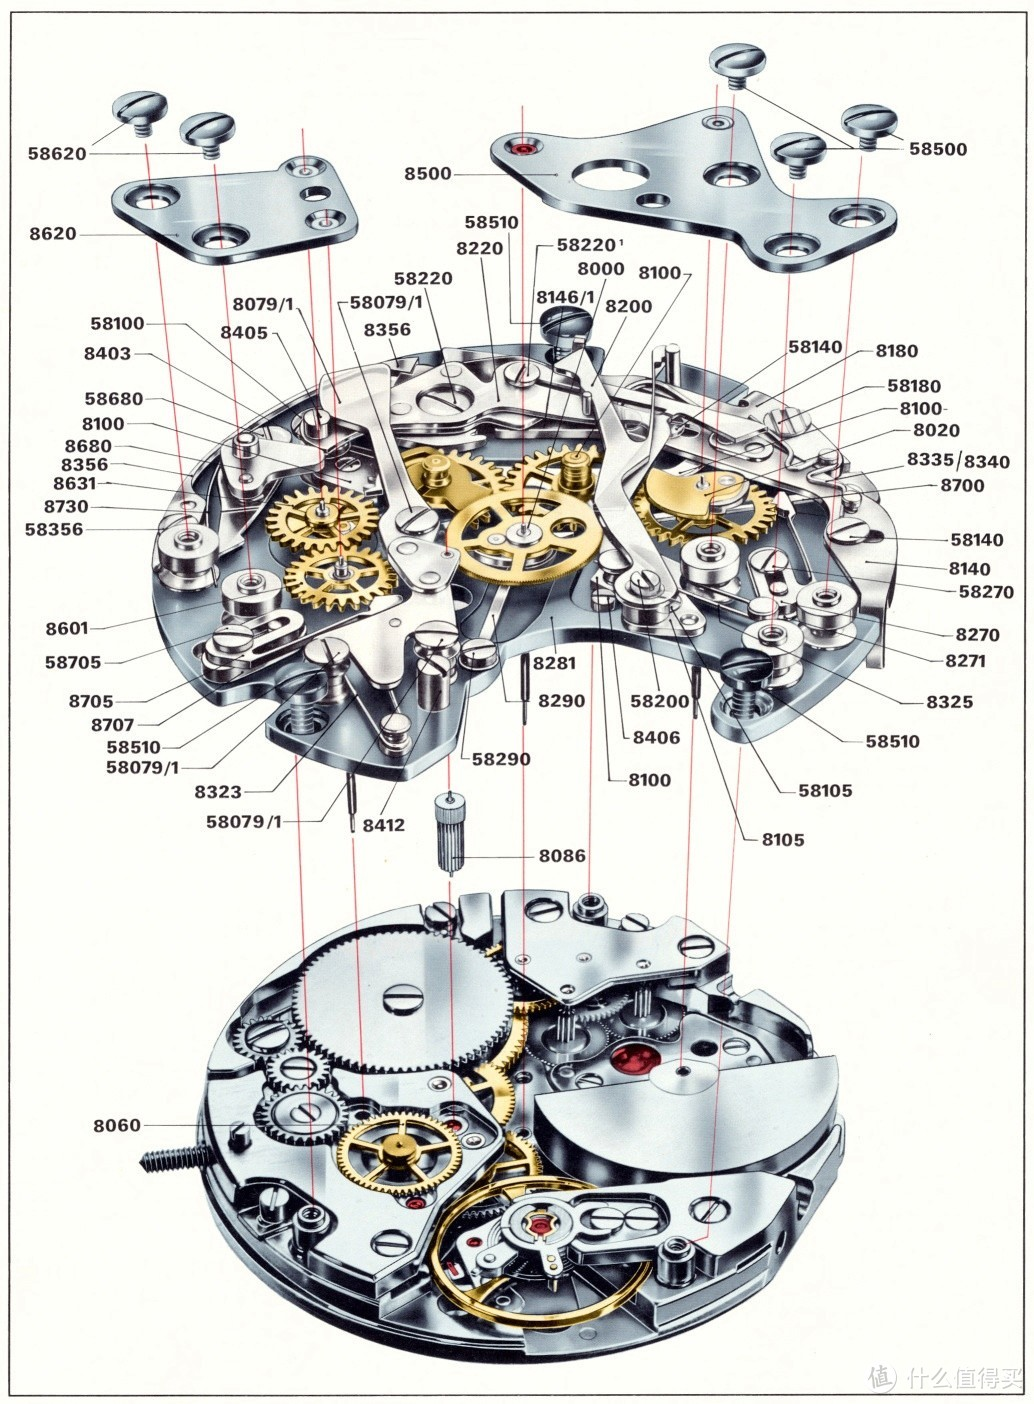 Cal.11自动计时机芯剖面图